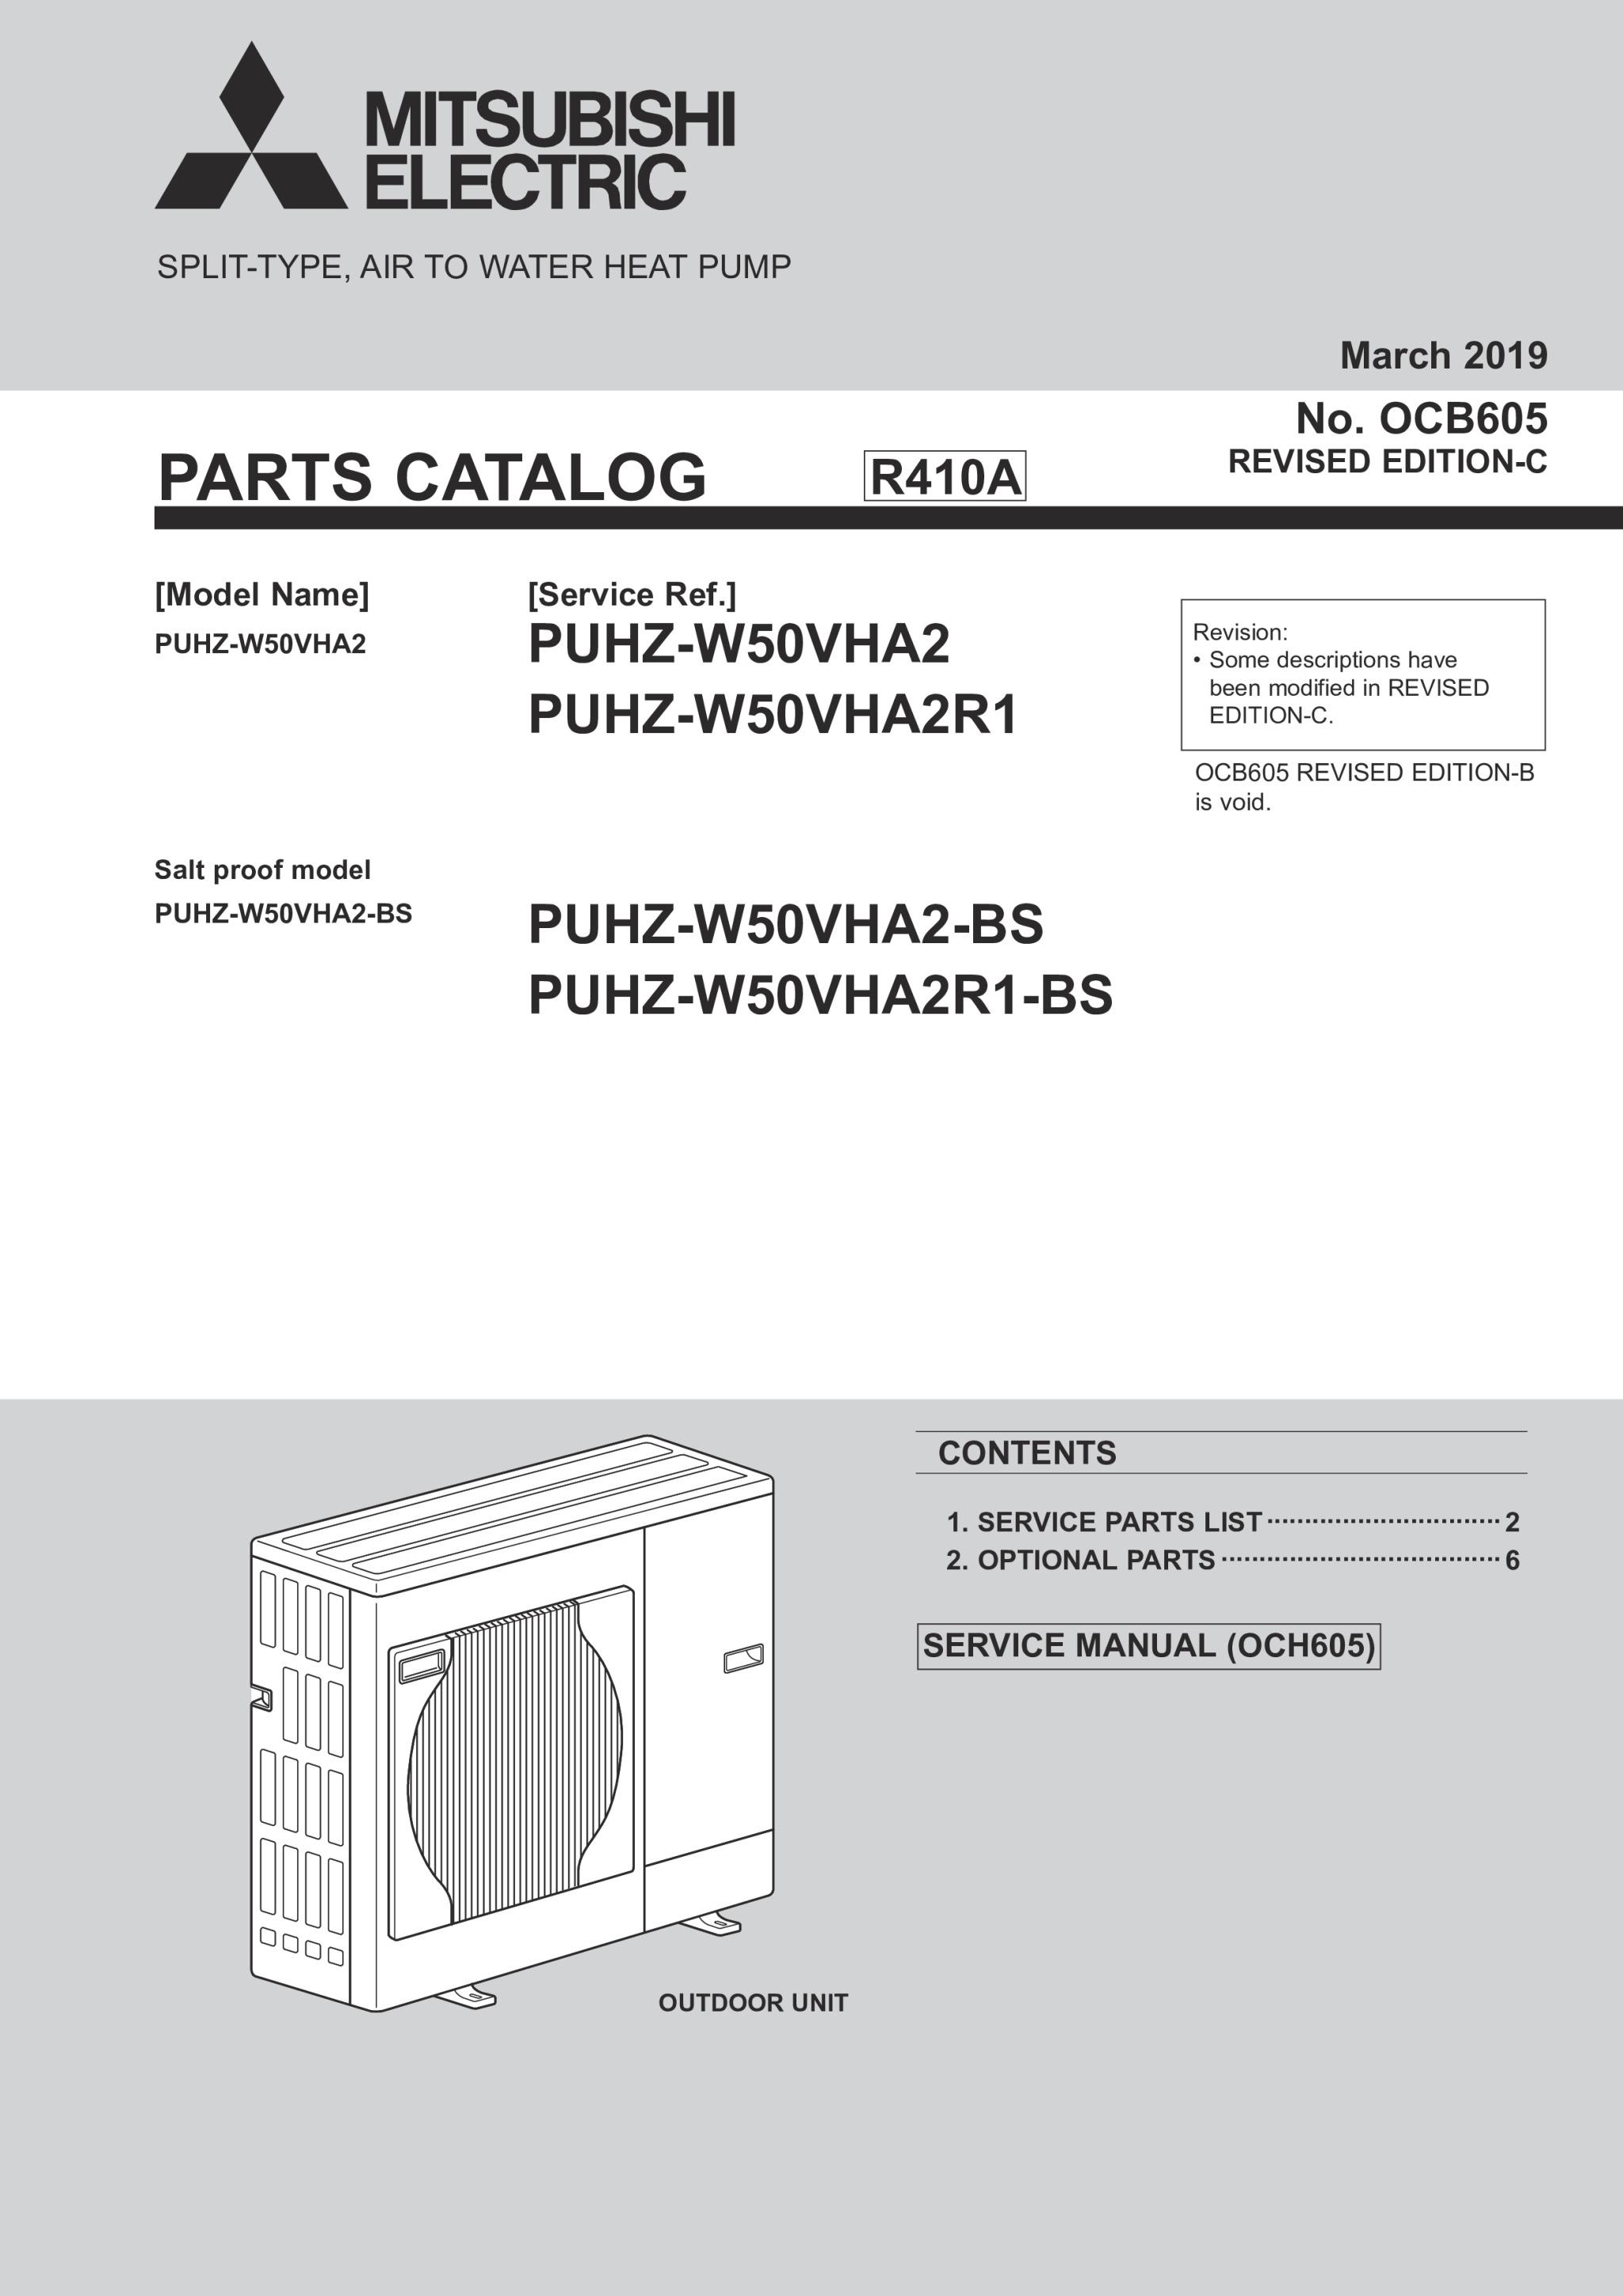 Mitsubishi Ecodan Wiring Diagram Trusted Diagrams Split System Schematics